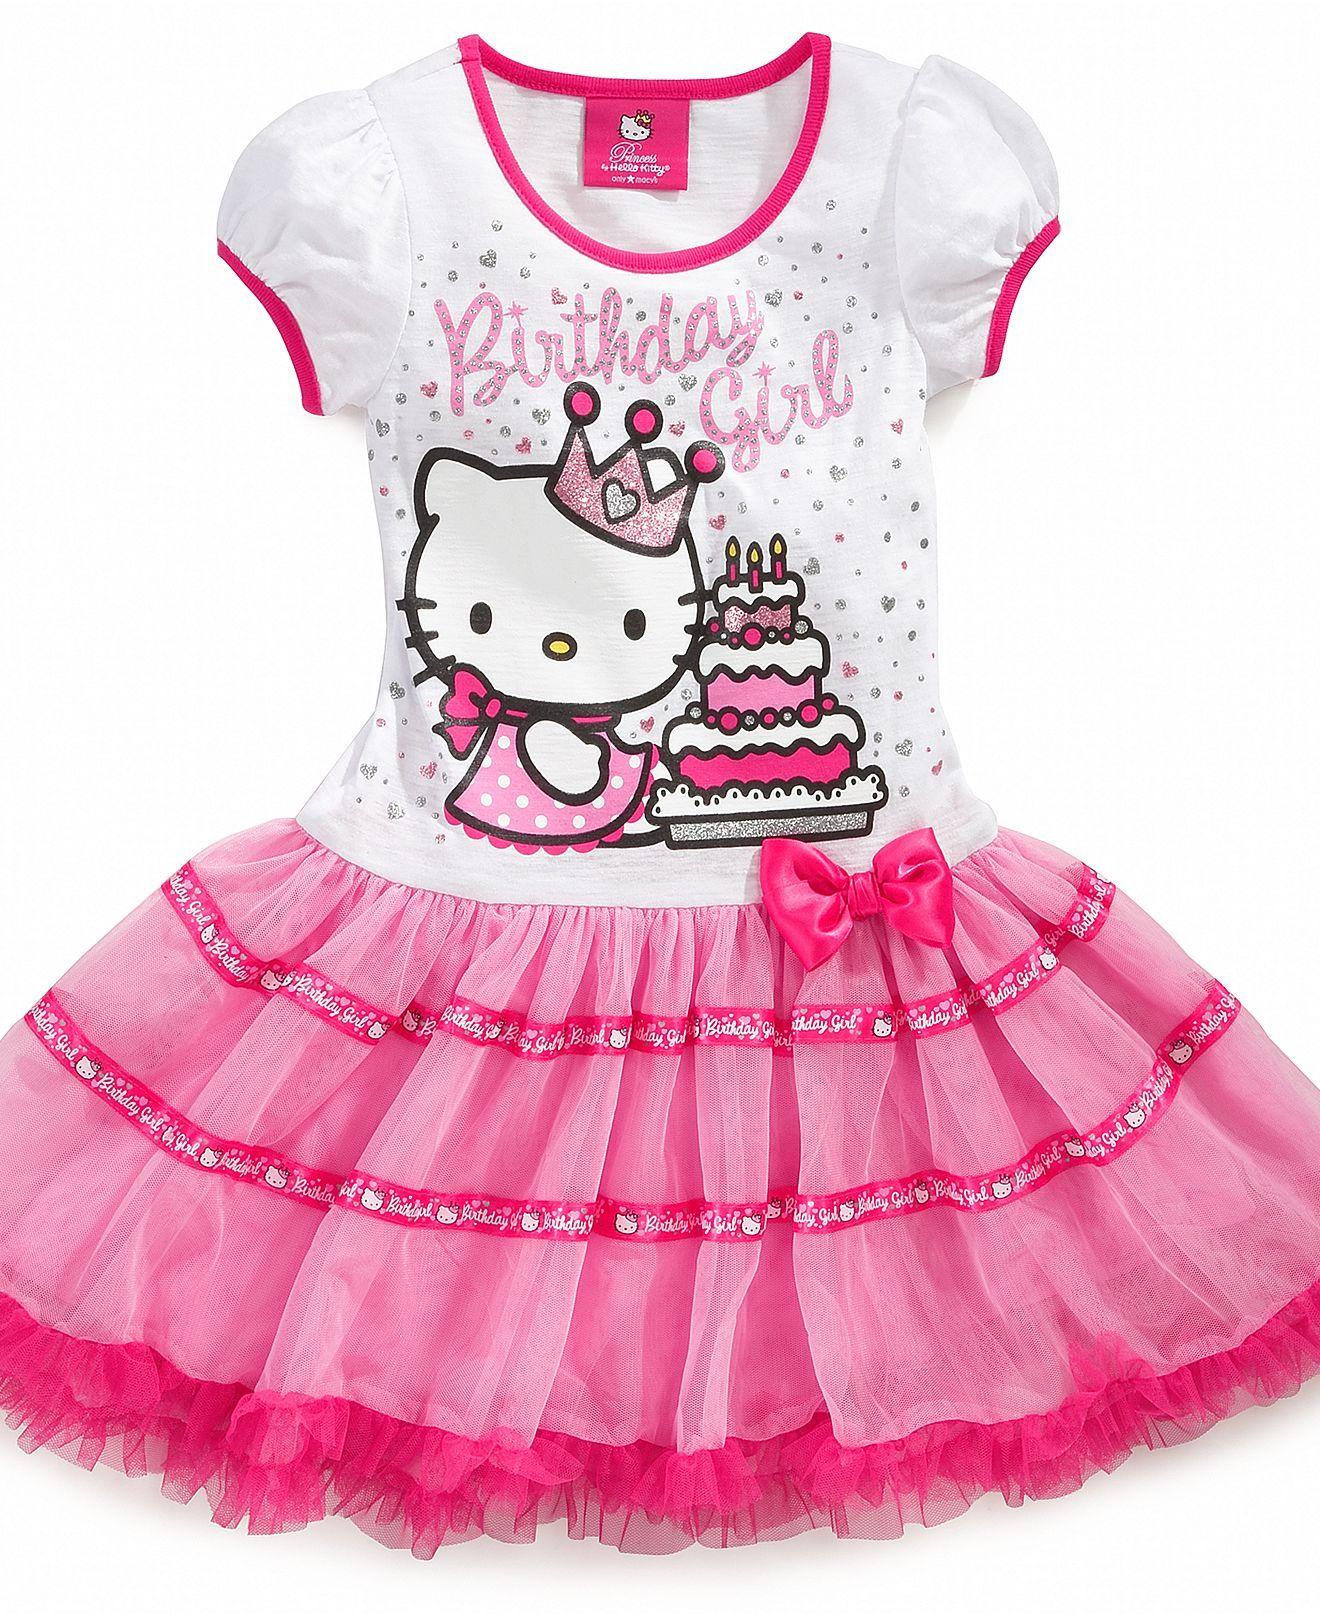 Hello Kitty Kids Dress Little Girls Birthday Tutu Dress